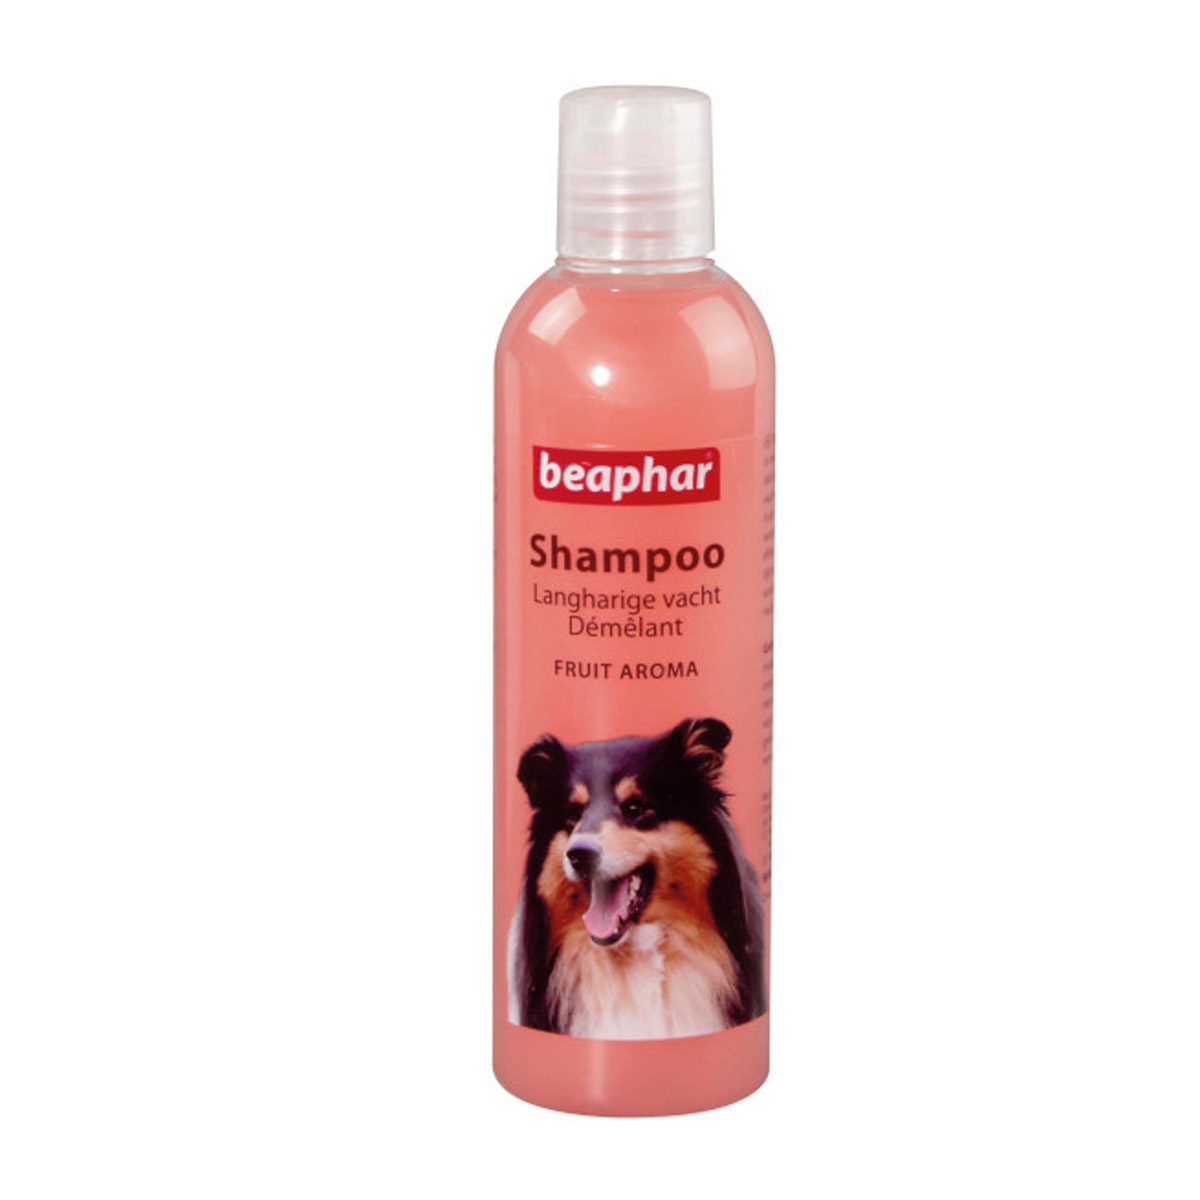 Beaphar Shampoo Hond Langharige-Vacht 250ml